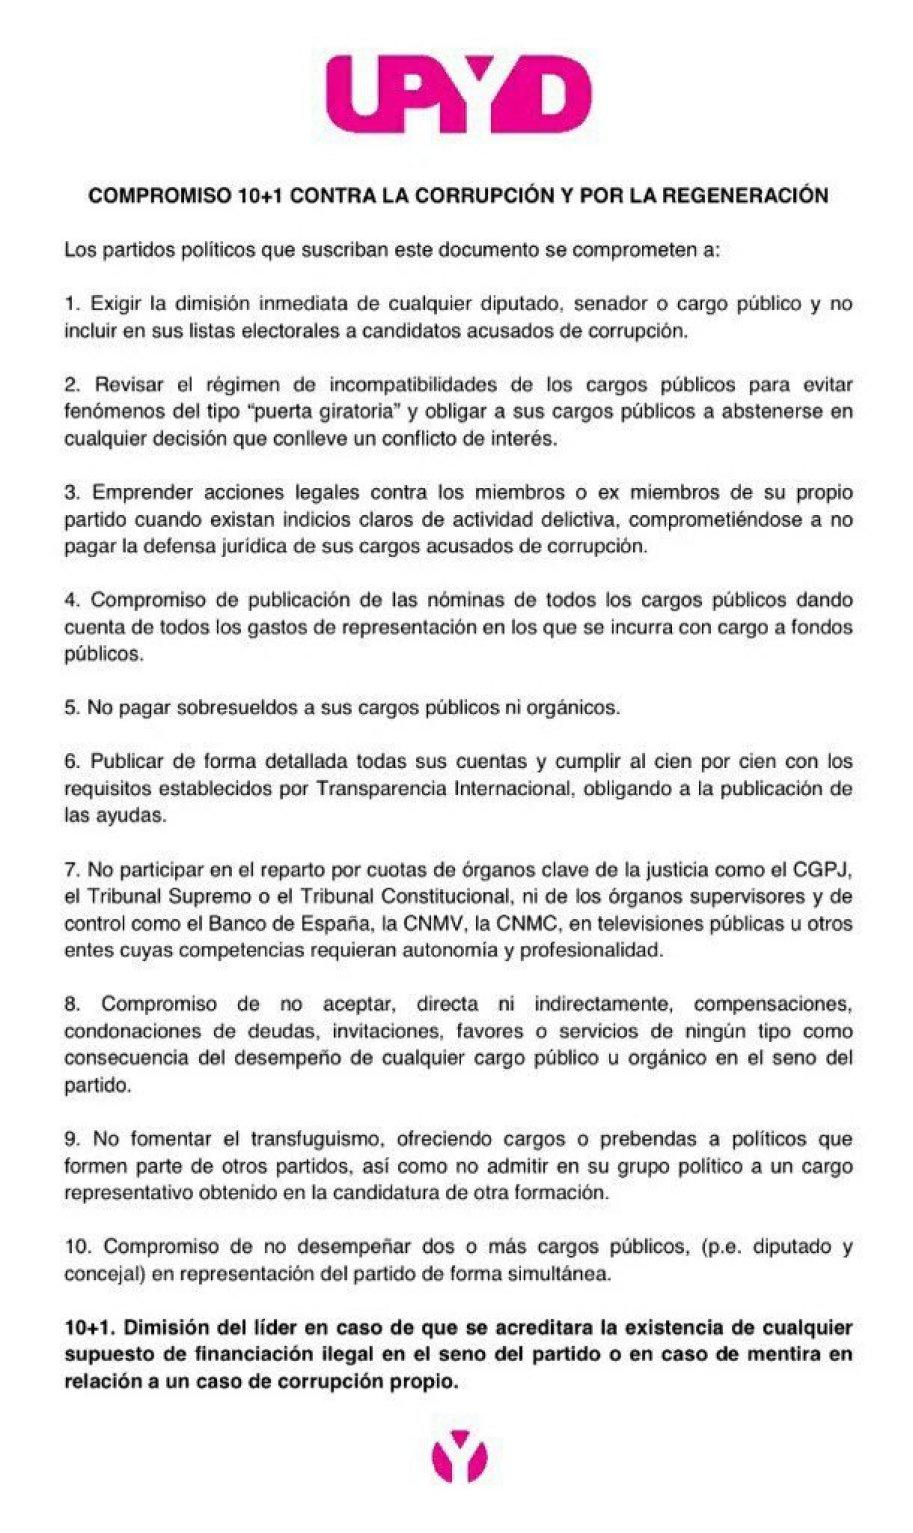 manifiesto 10+1